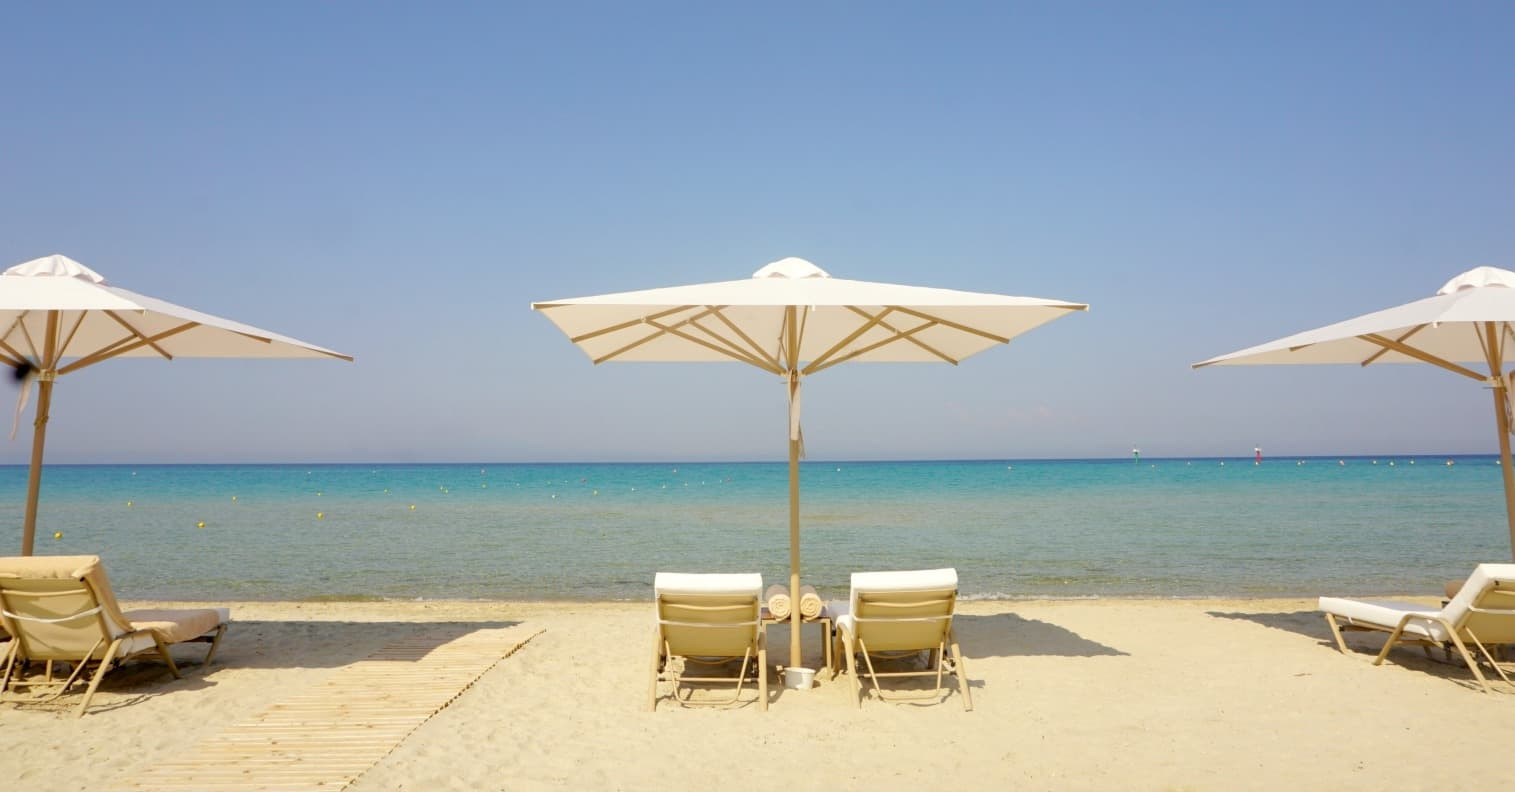 Greece and a look at Sani Dunes and Ikos Resorts